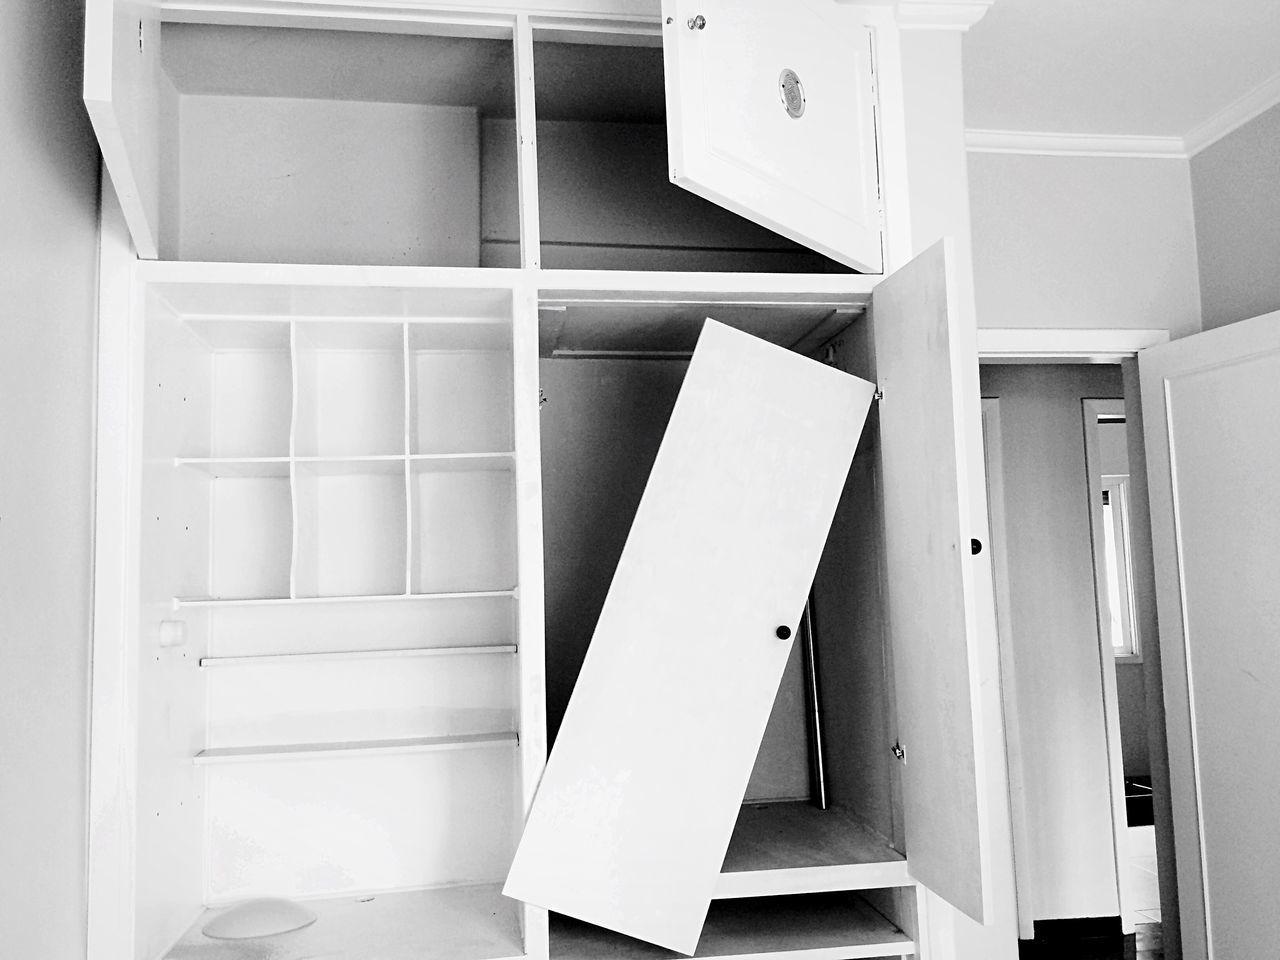 Broken cabinet at home